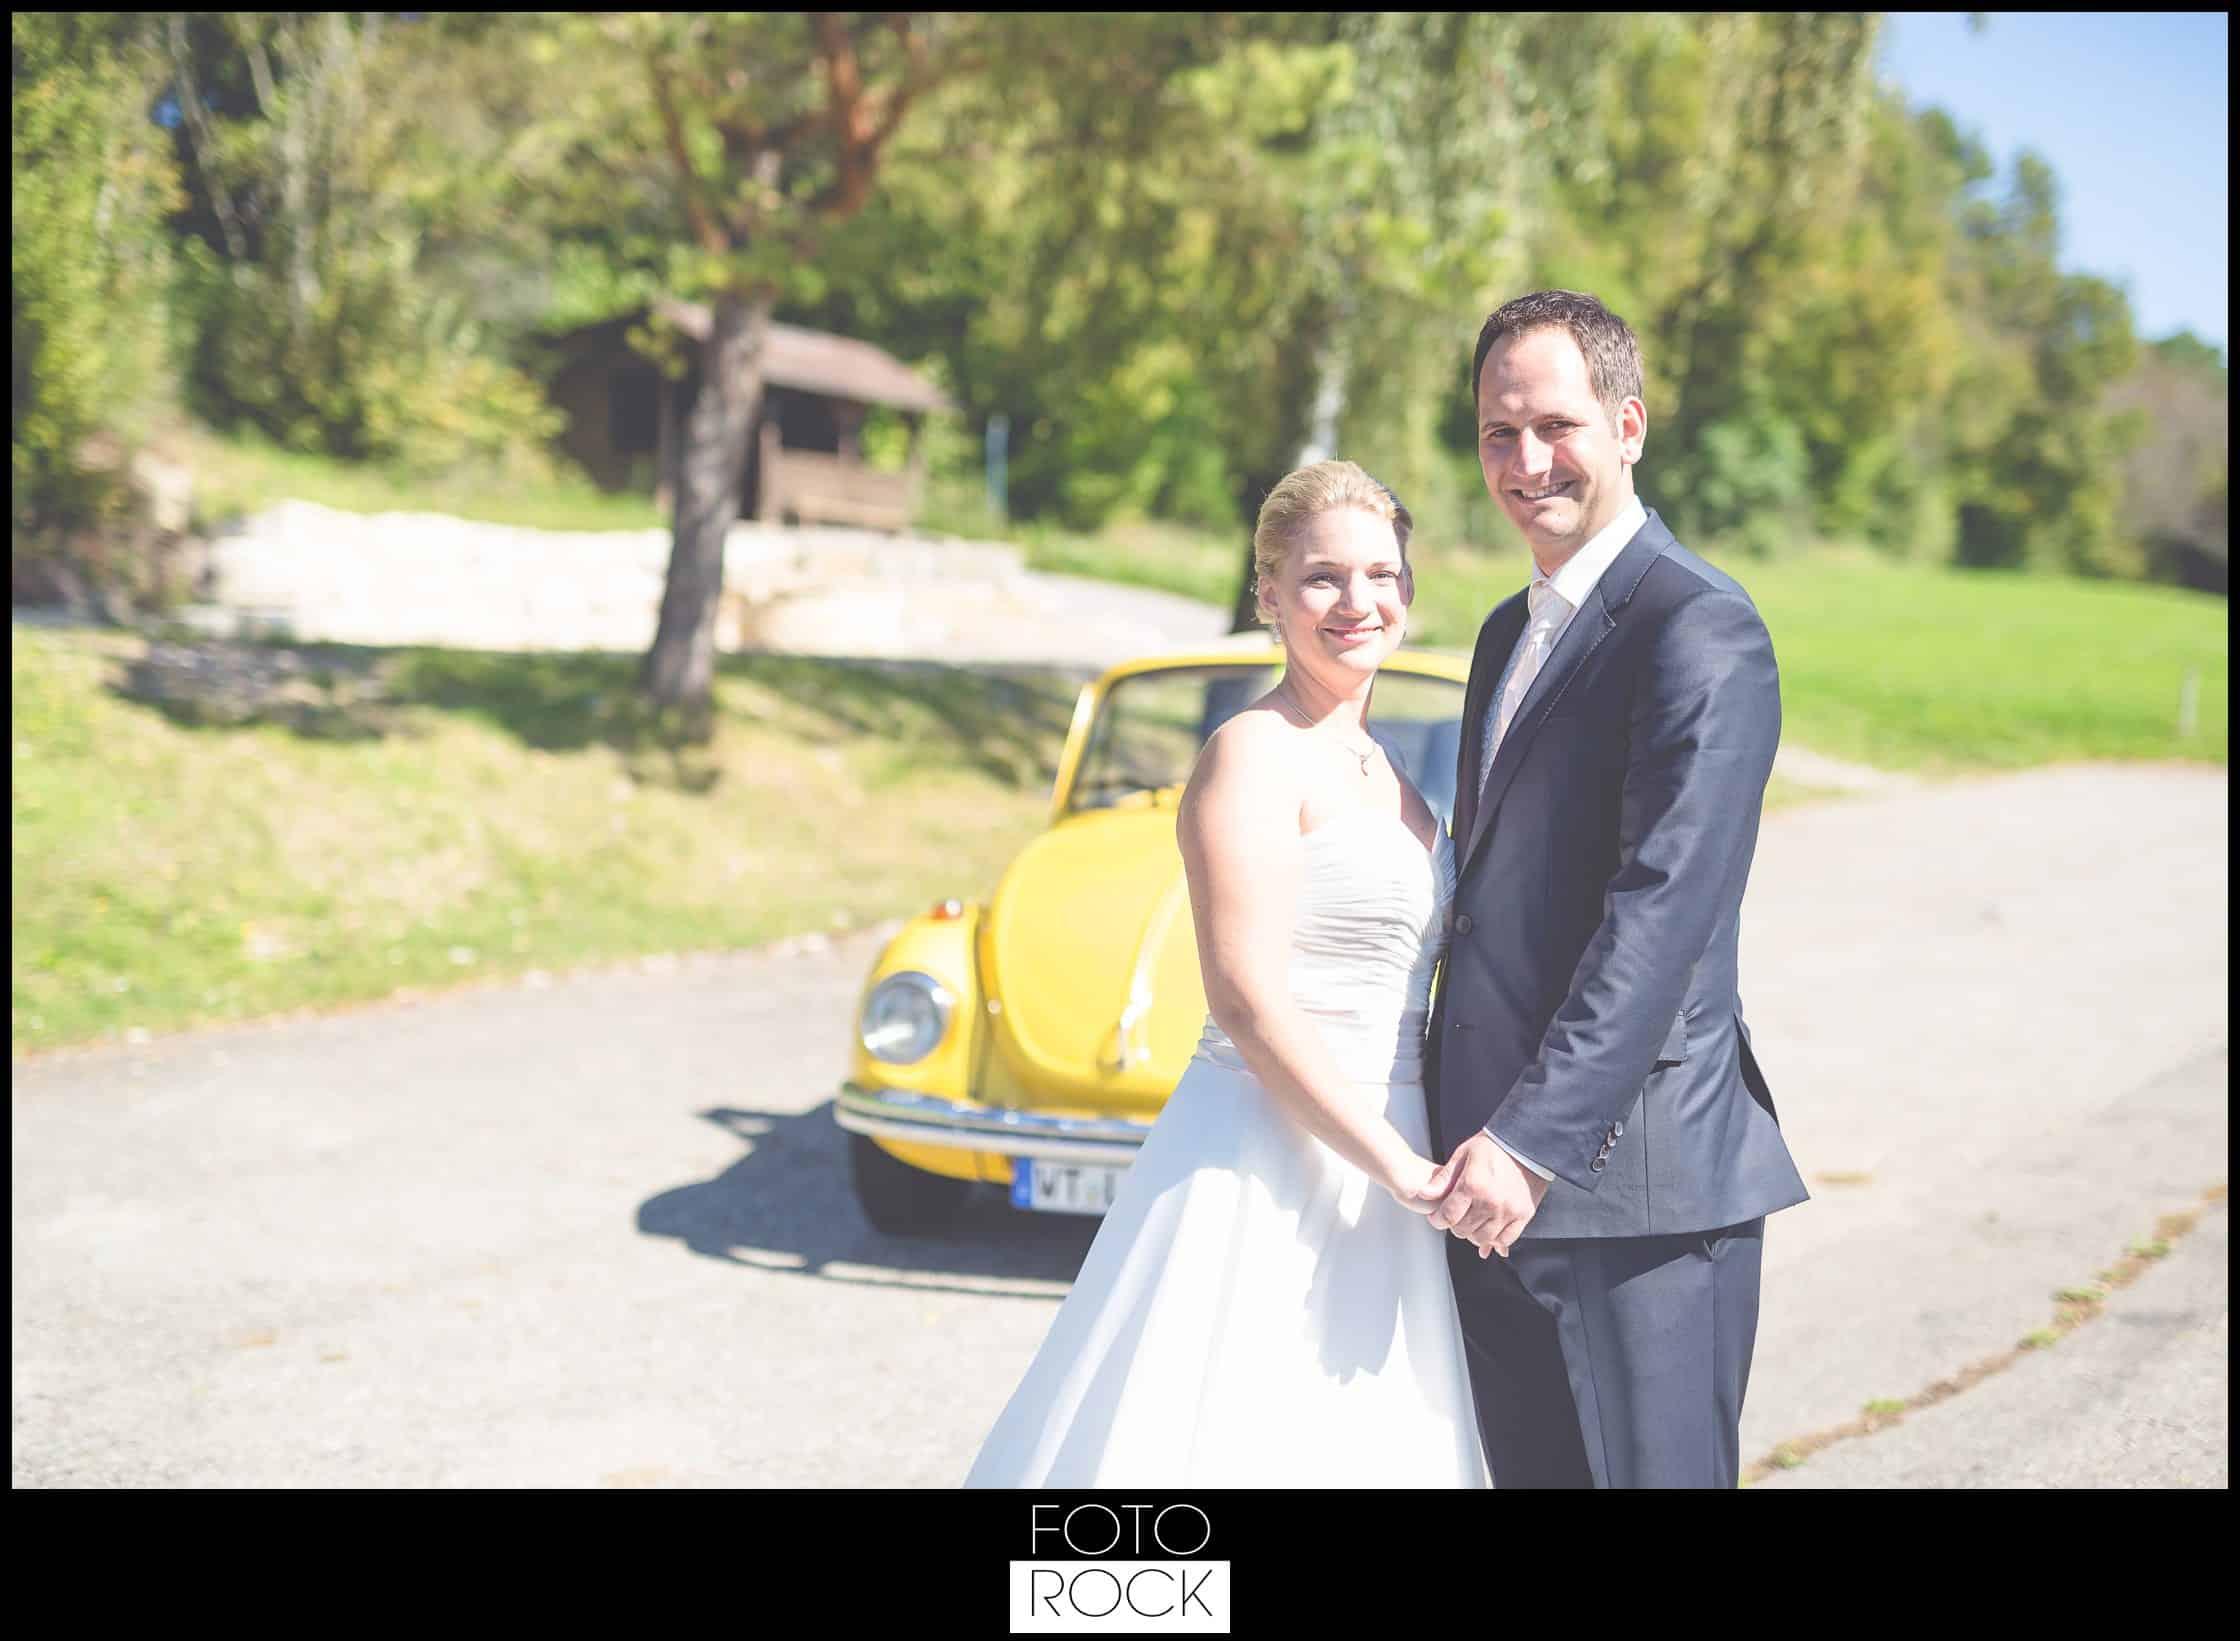 Hochzeit Adler Haeusern vw käfer brautpaar